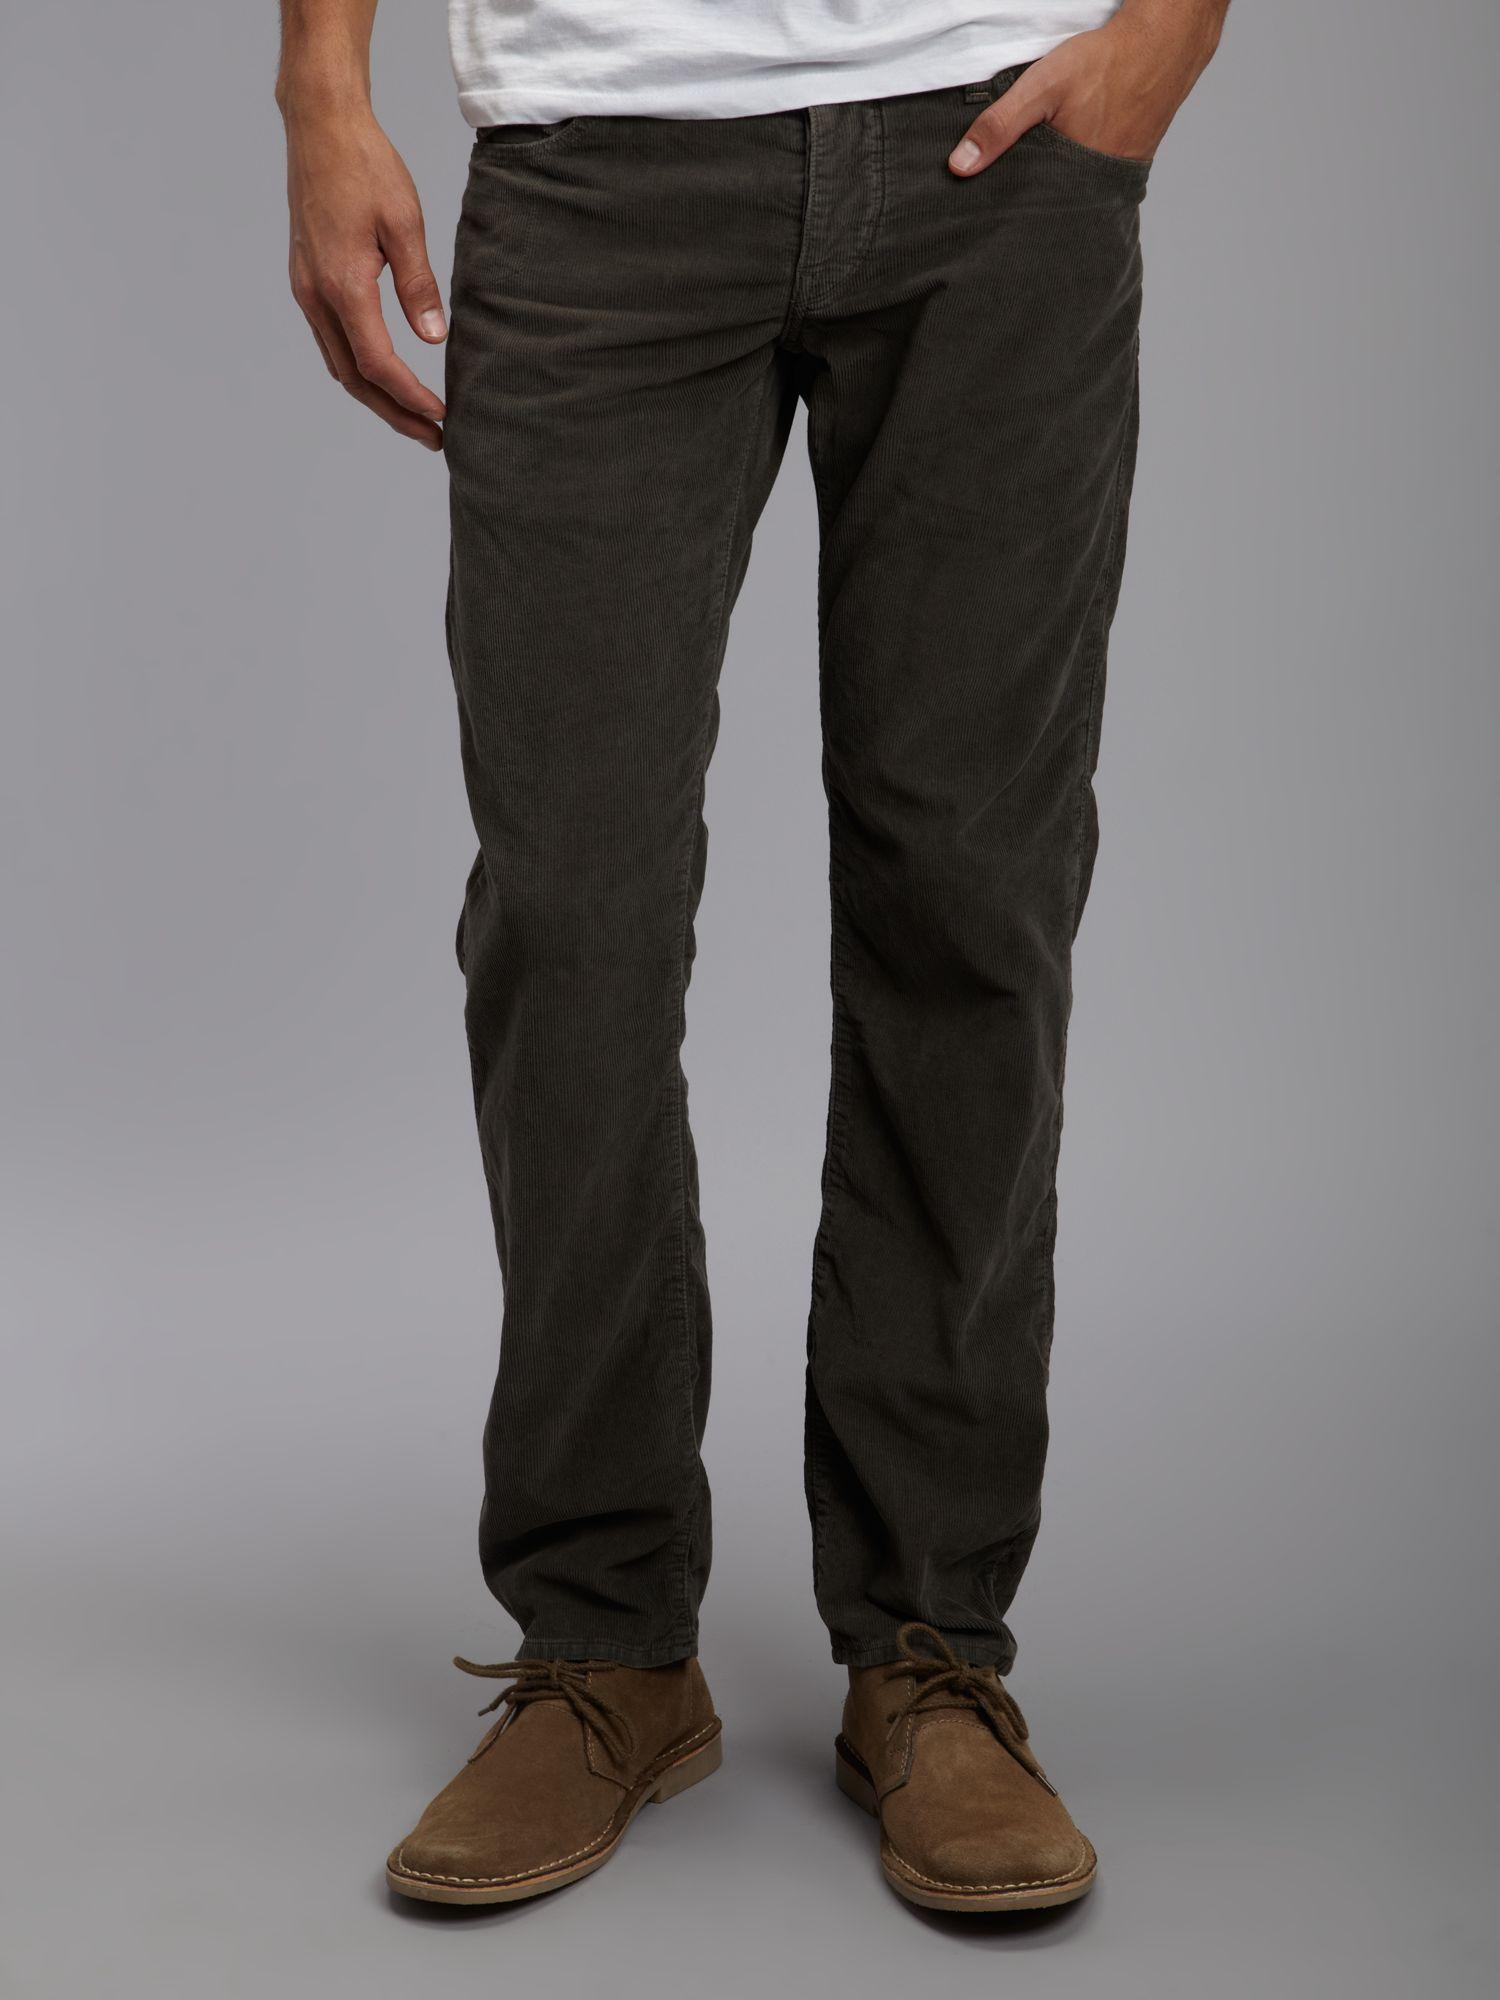 lyst g star raw straight fit morris jeans in black for men. Black Bedroom Furniture Sets. Home Design Ideas